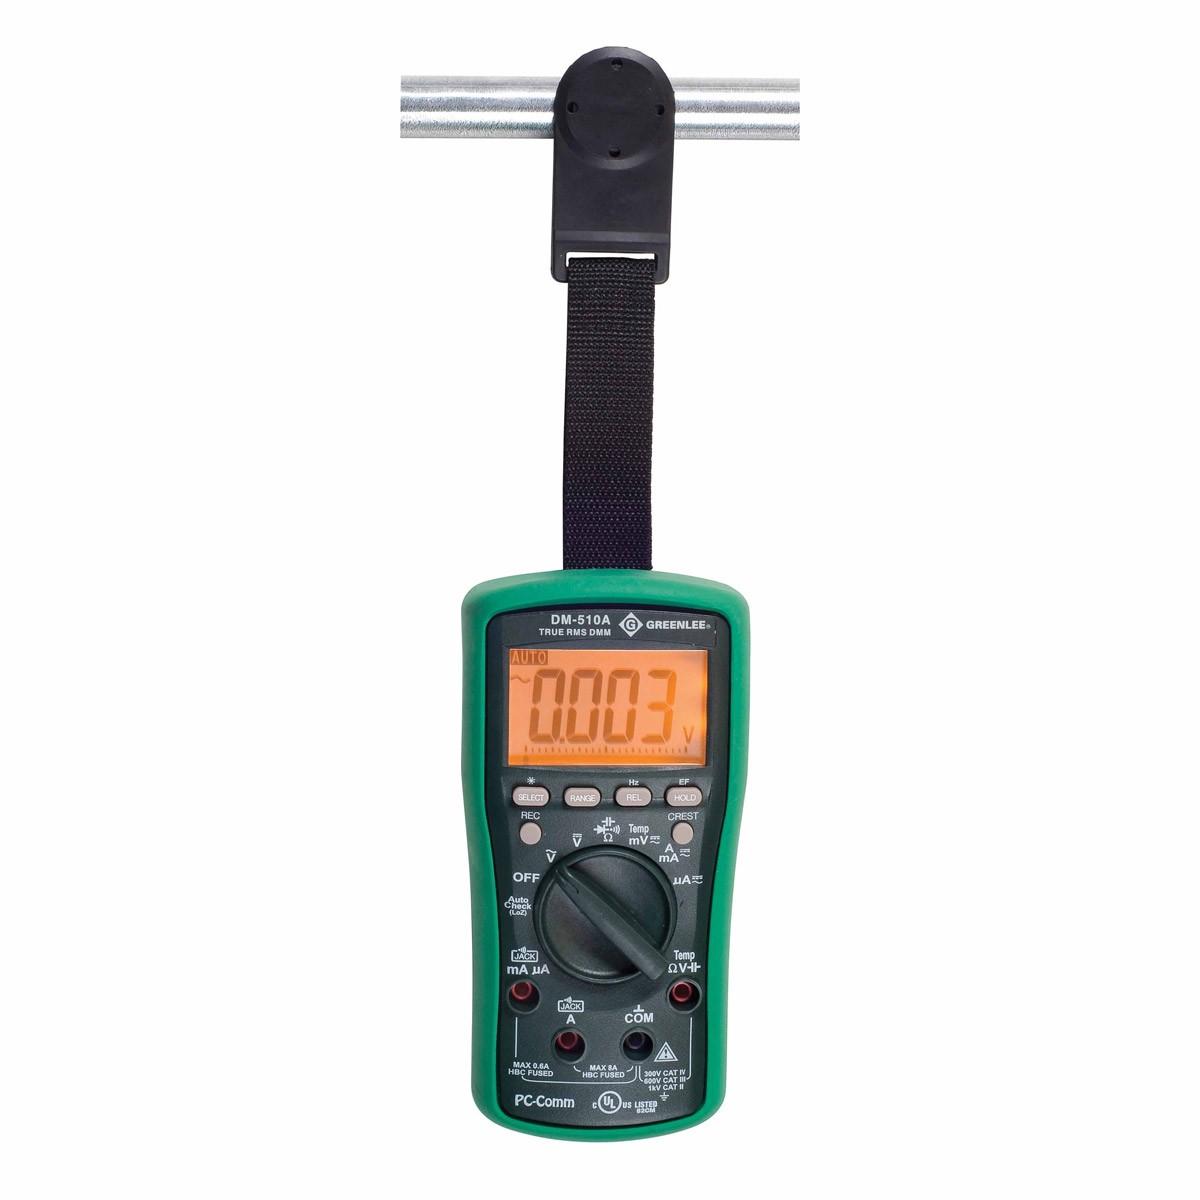 Electrical Tester Greenlee Dm 40 : Greenlee dm a digital multimeter